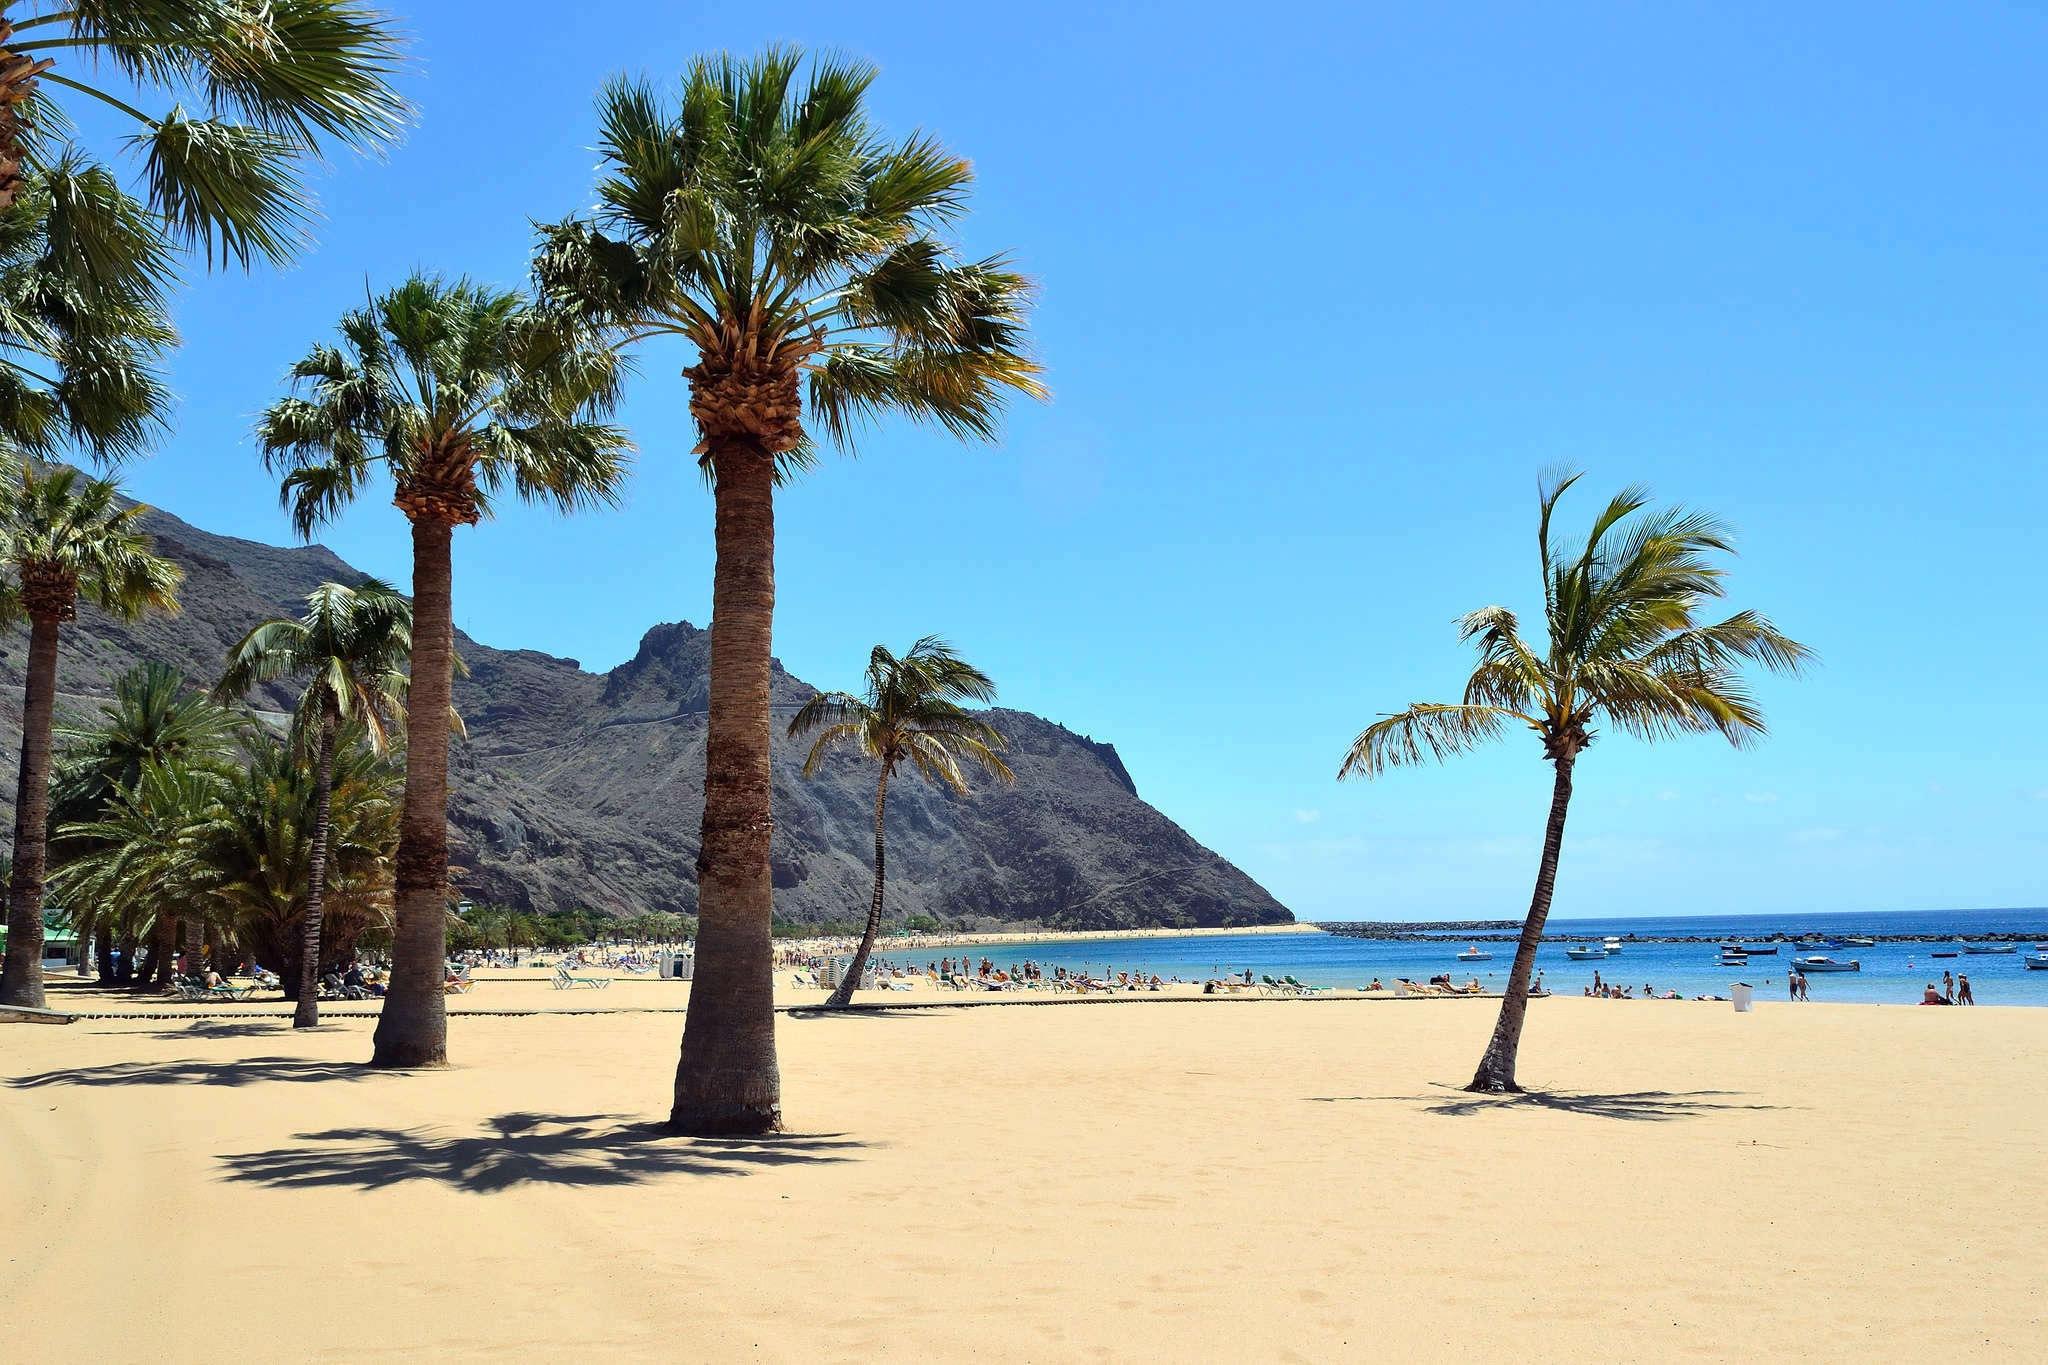 Playa La Bruja